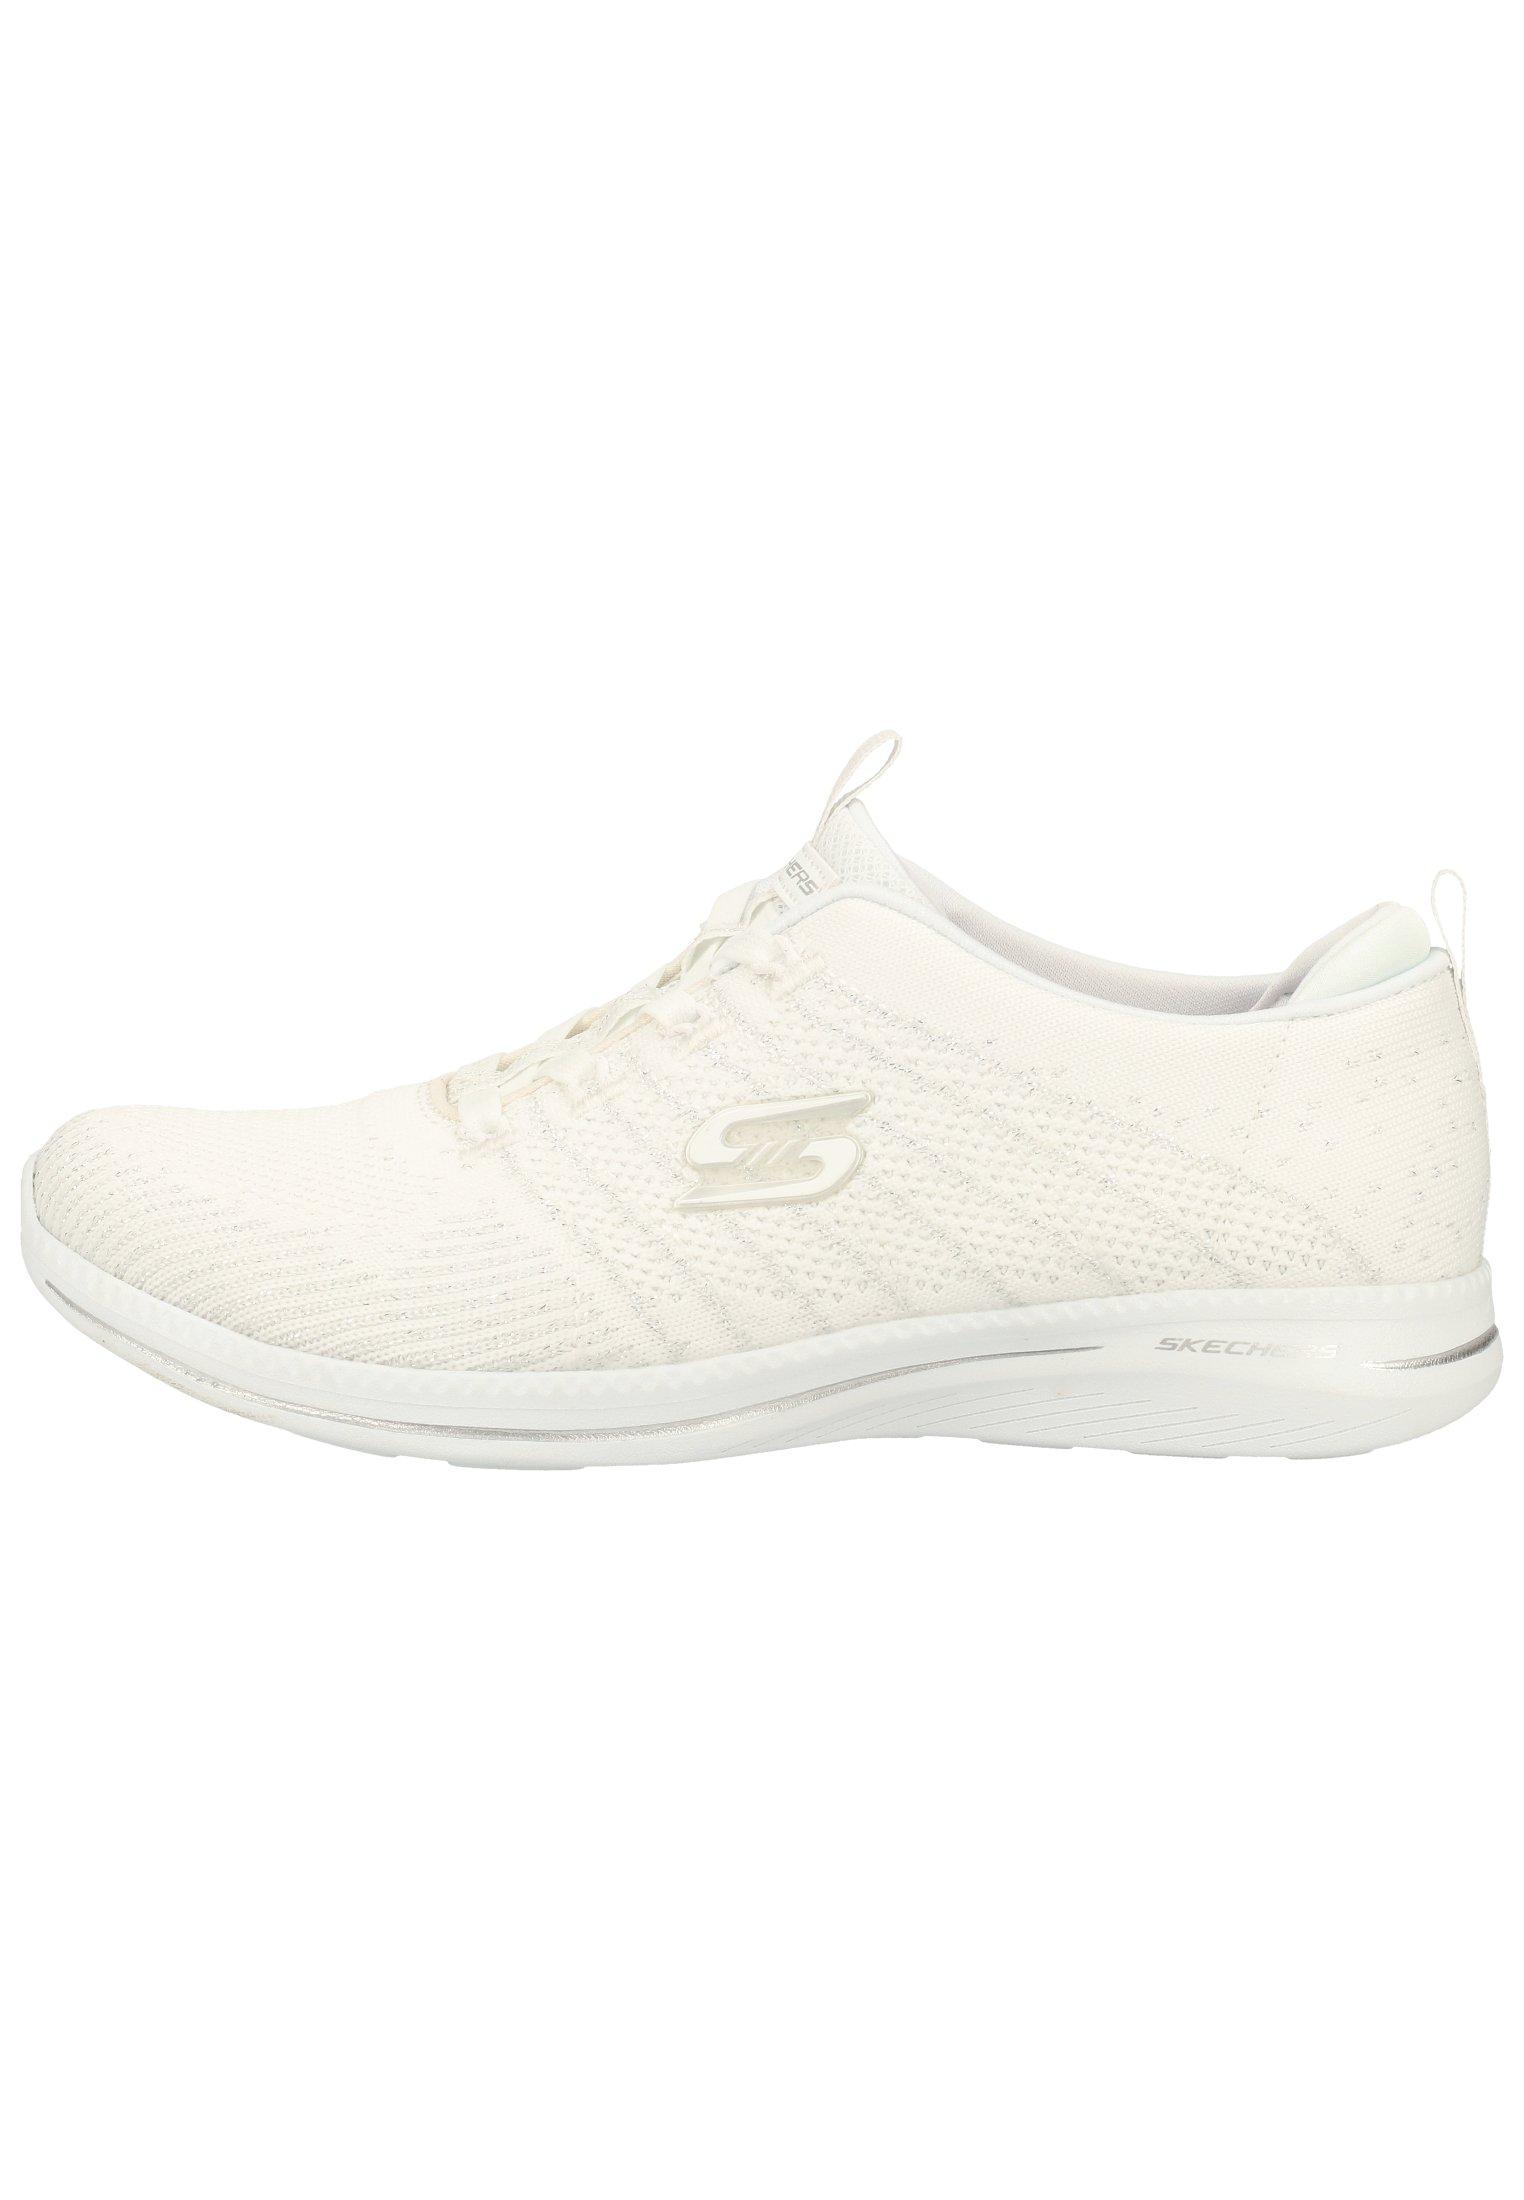 CITY PRO Sneakers white